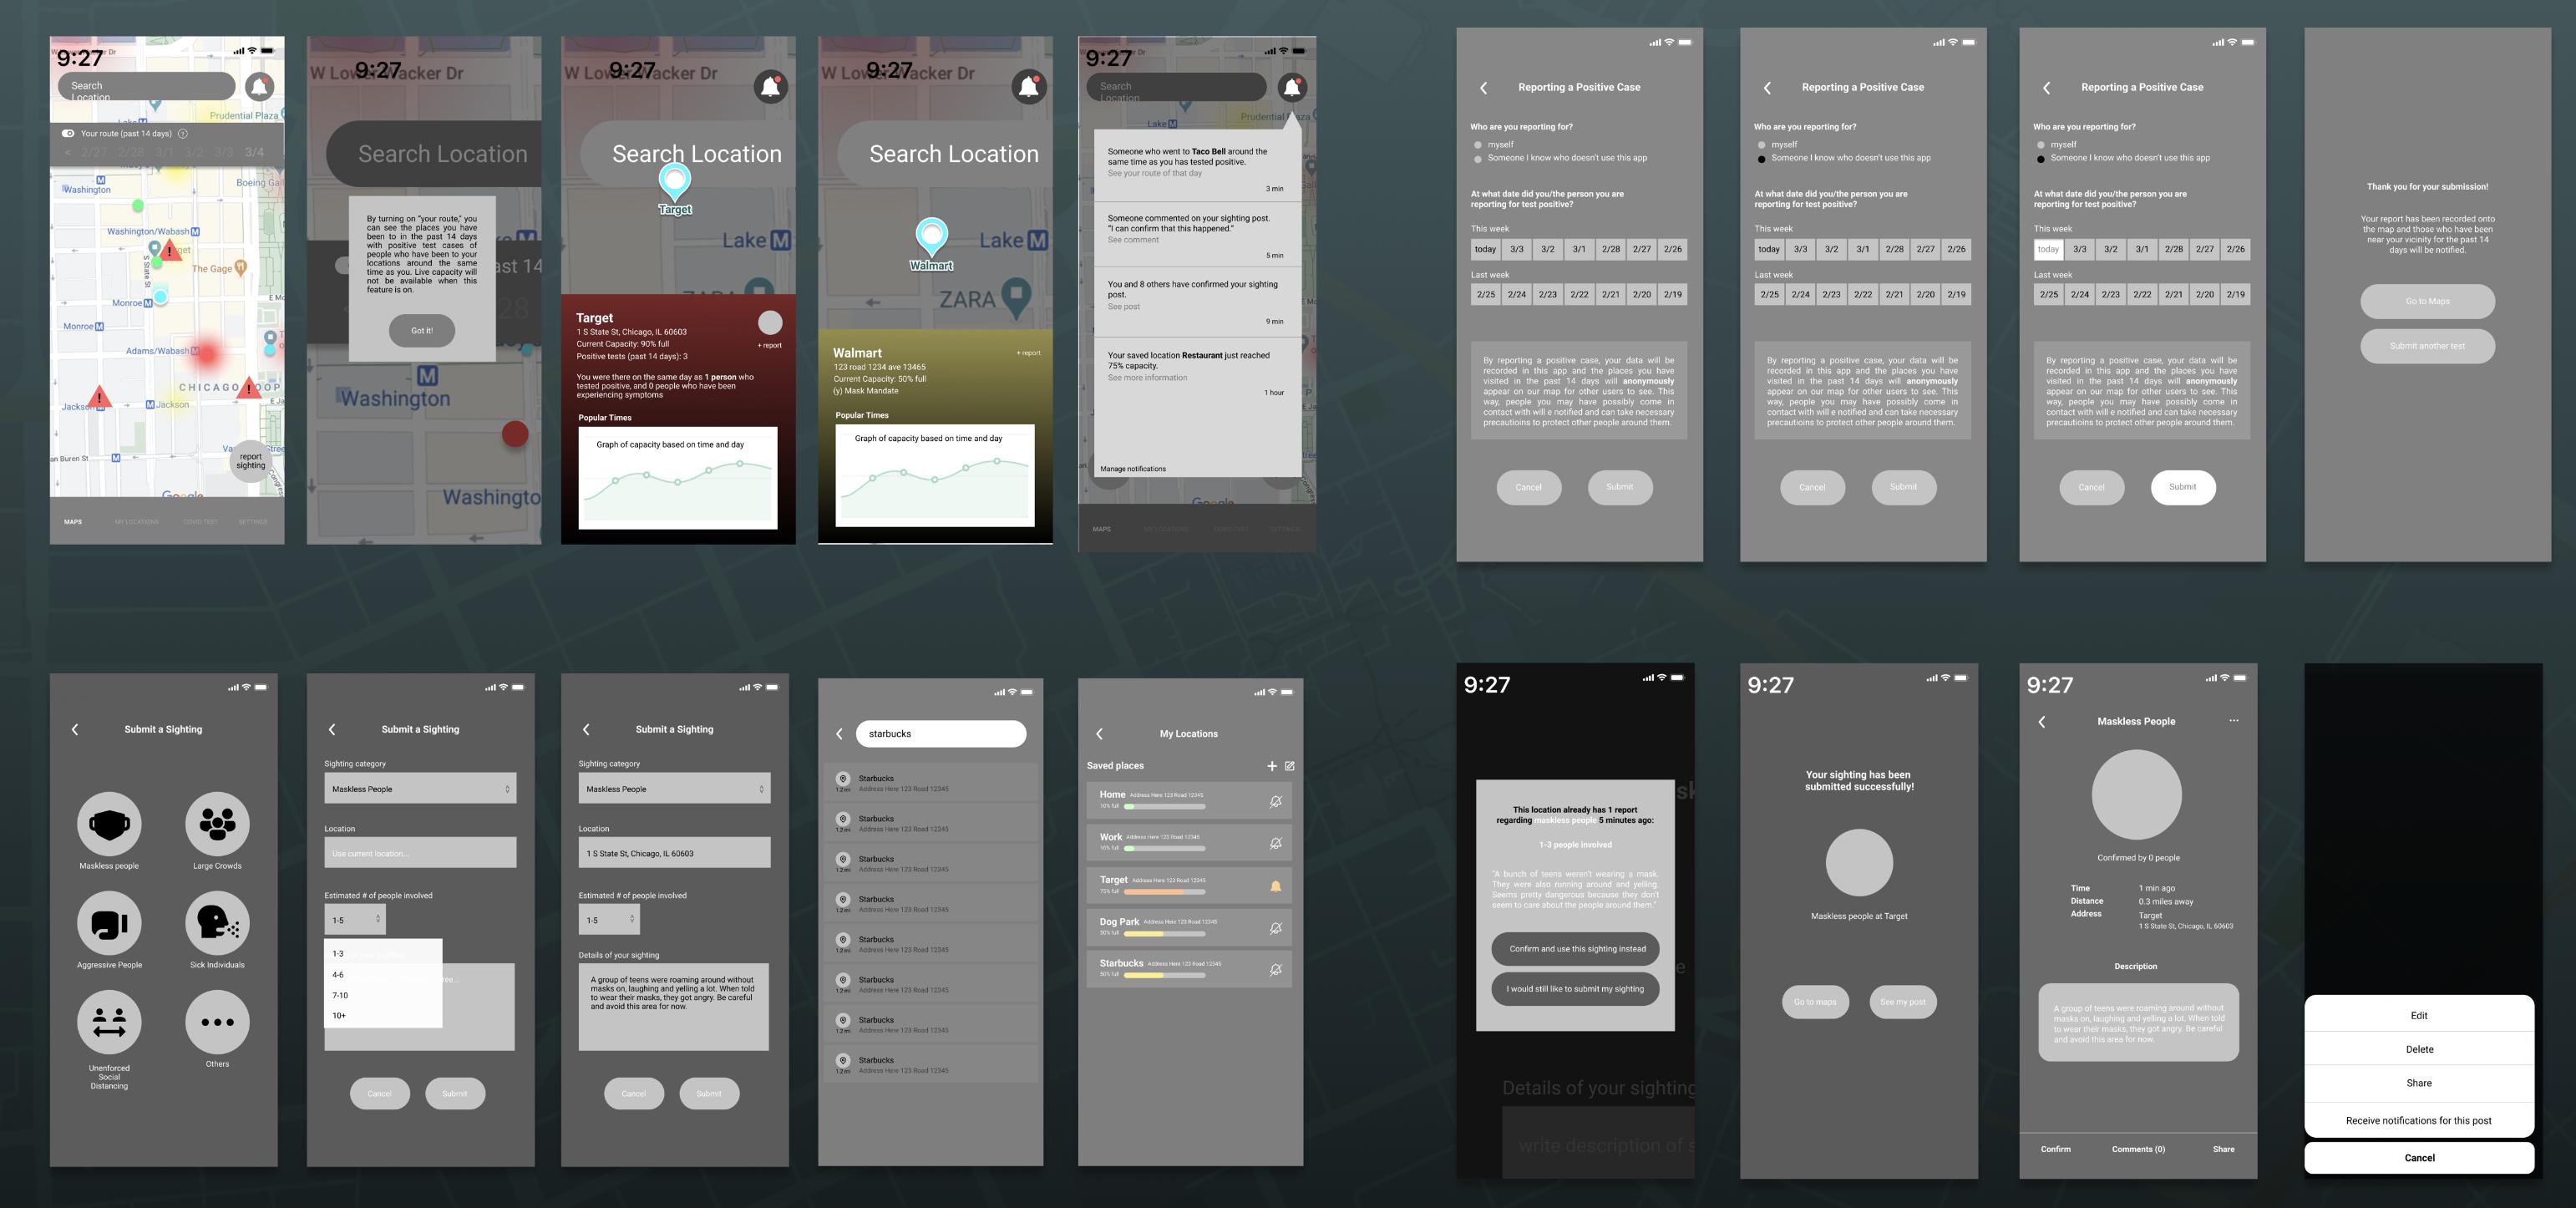 Midfi prototype screens (click to expand)